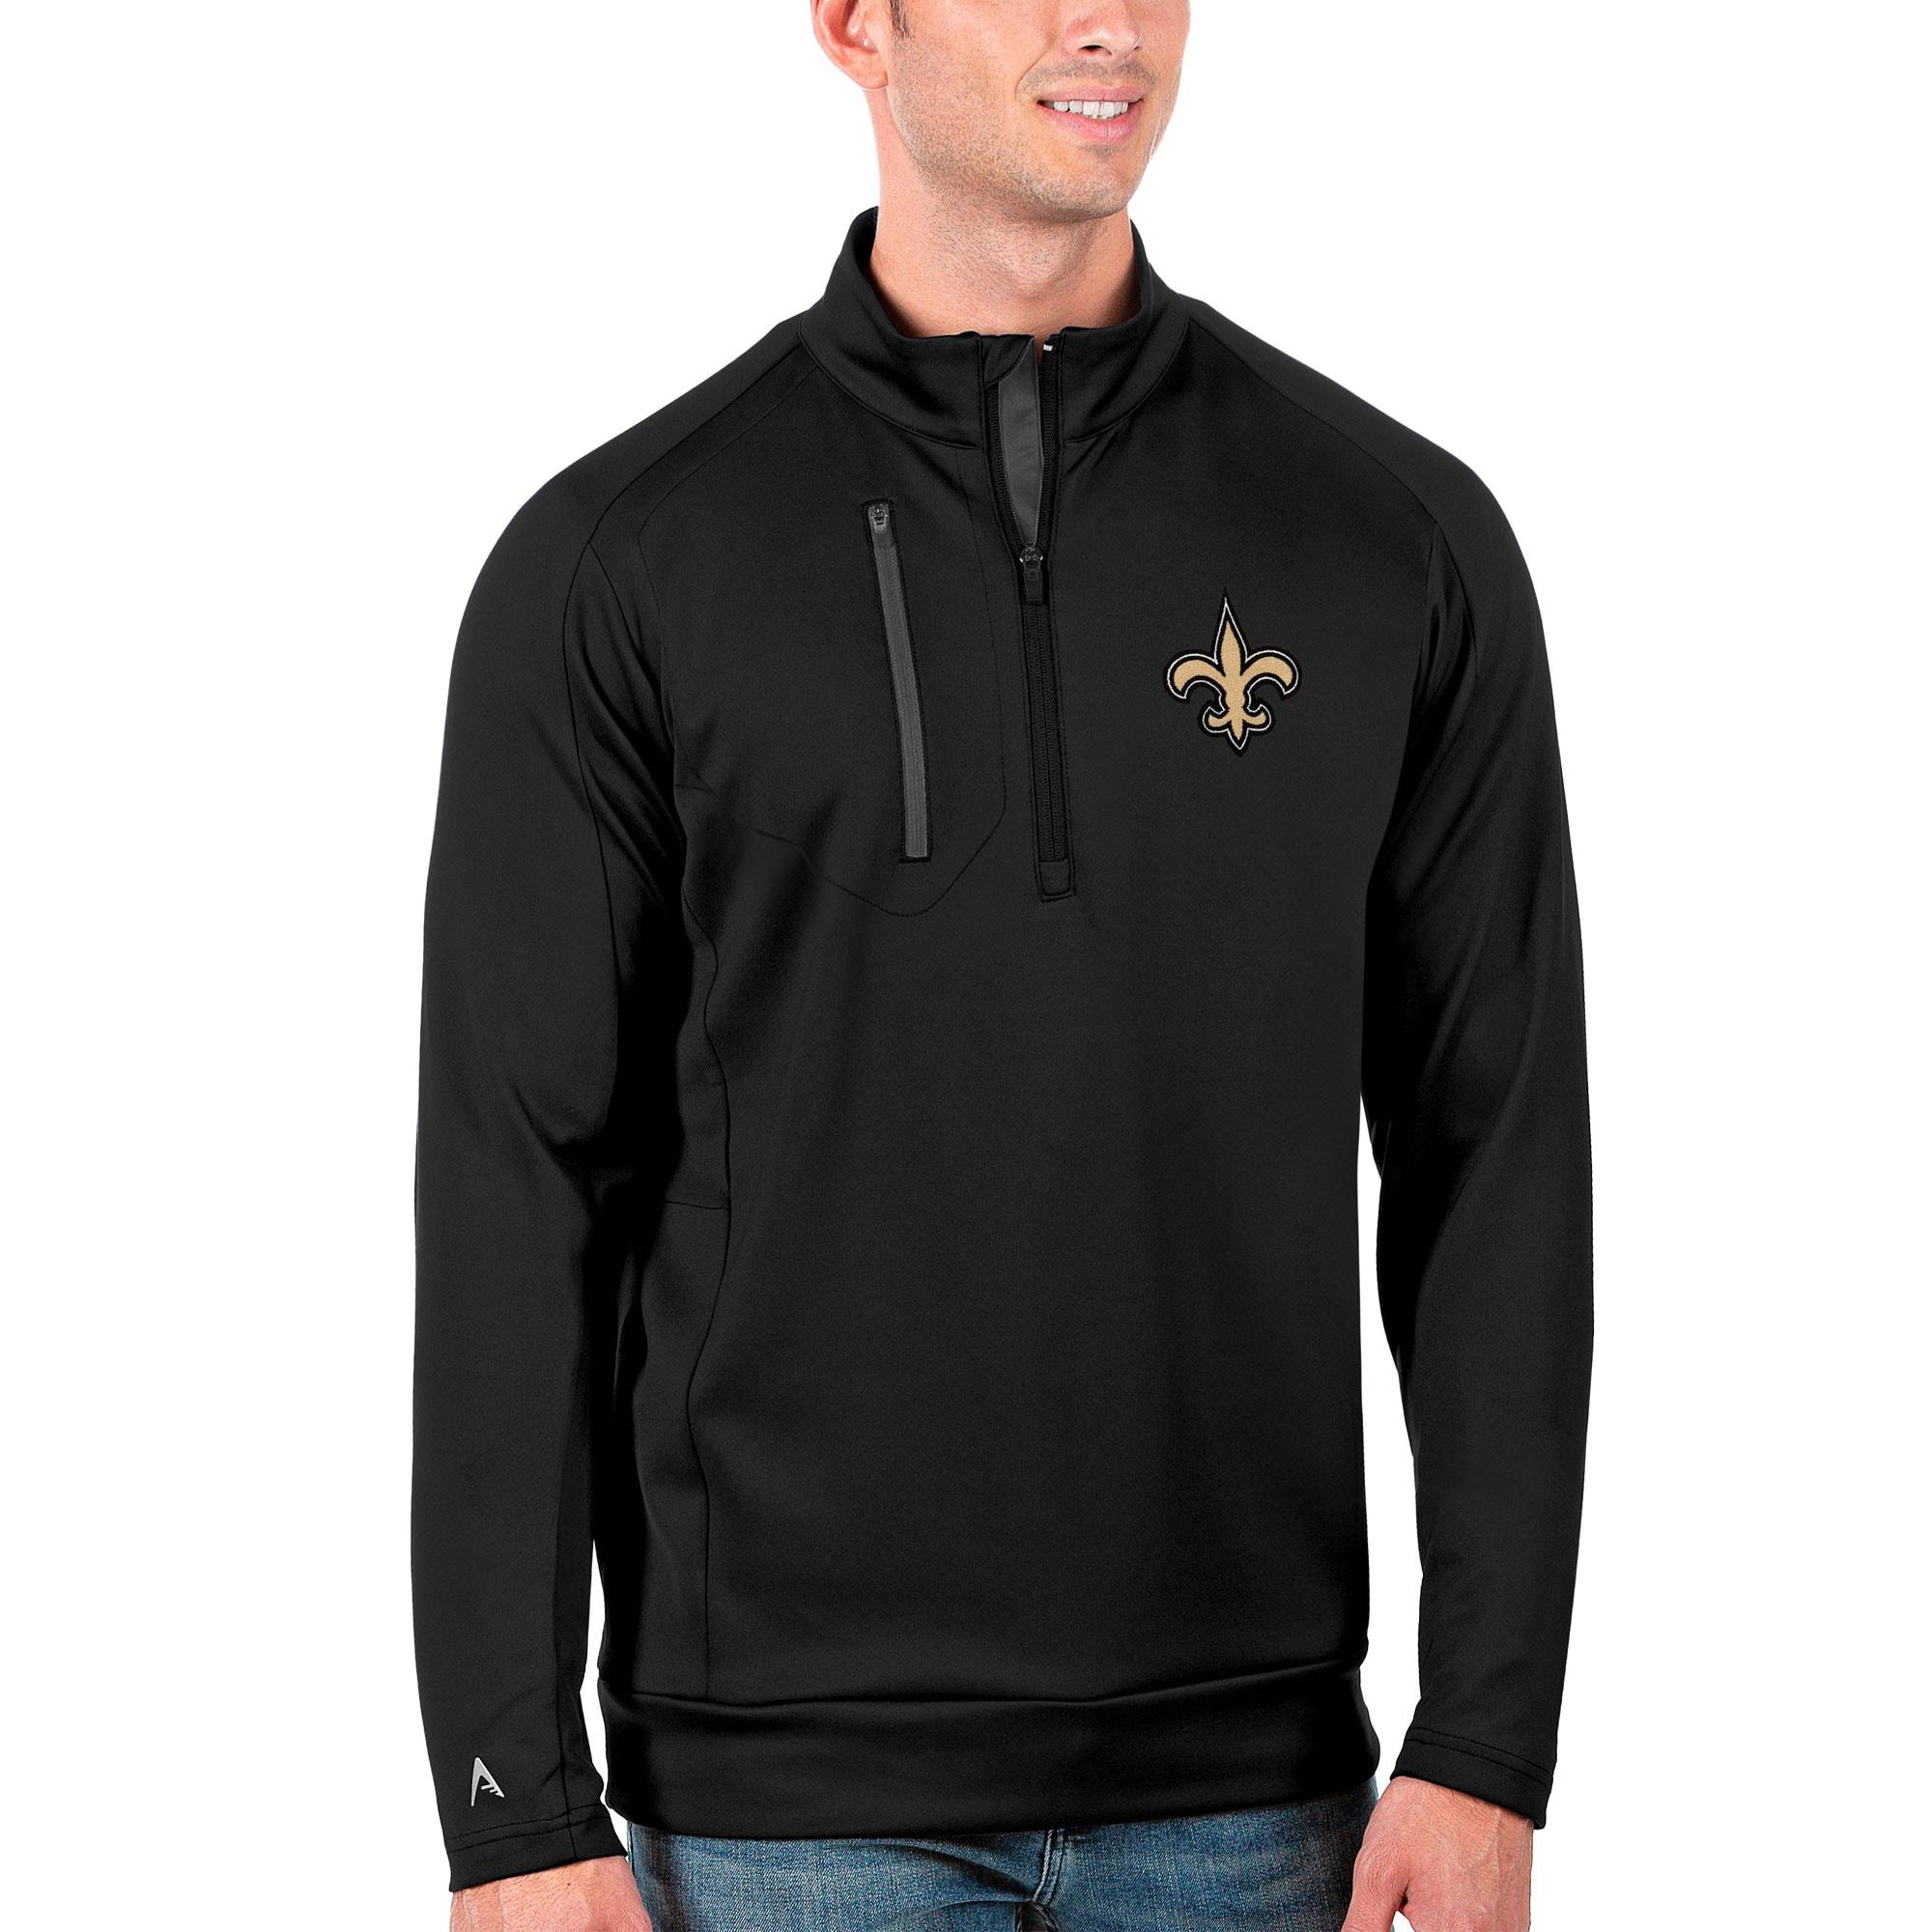 New Orleans Saints Antigua Generation Quarter-Zip Pullover Jacket - Black/Charcoal